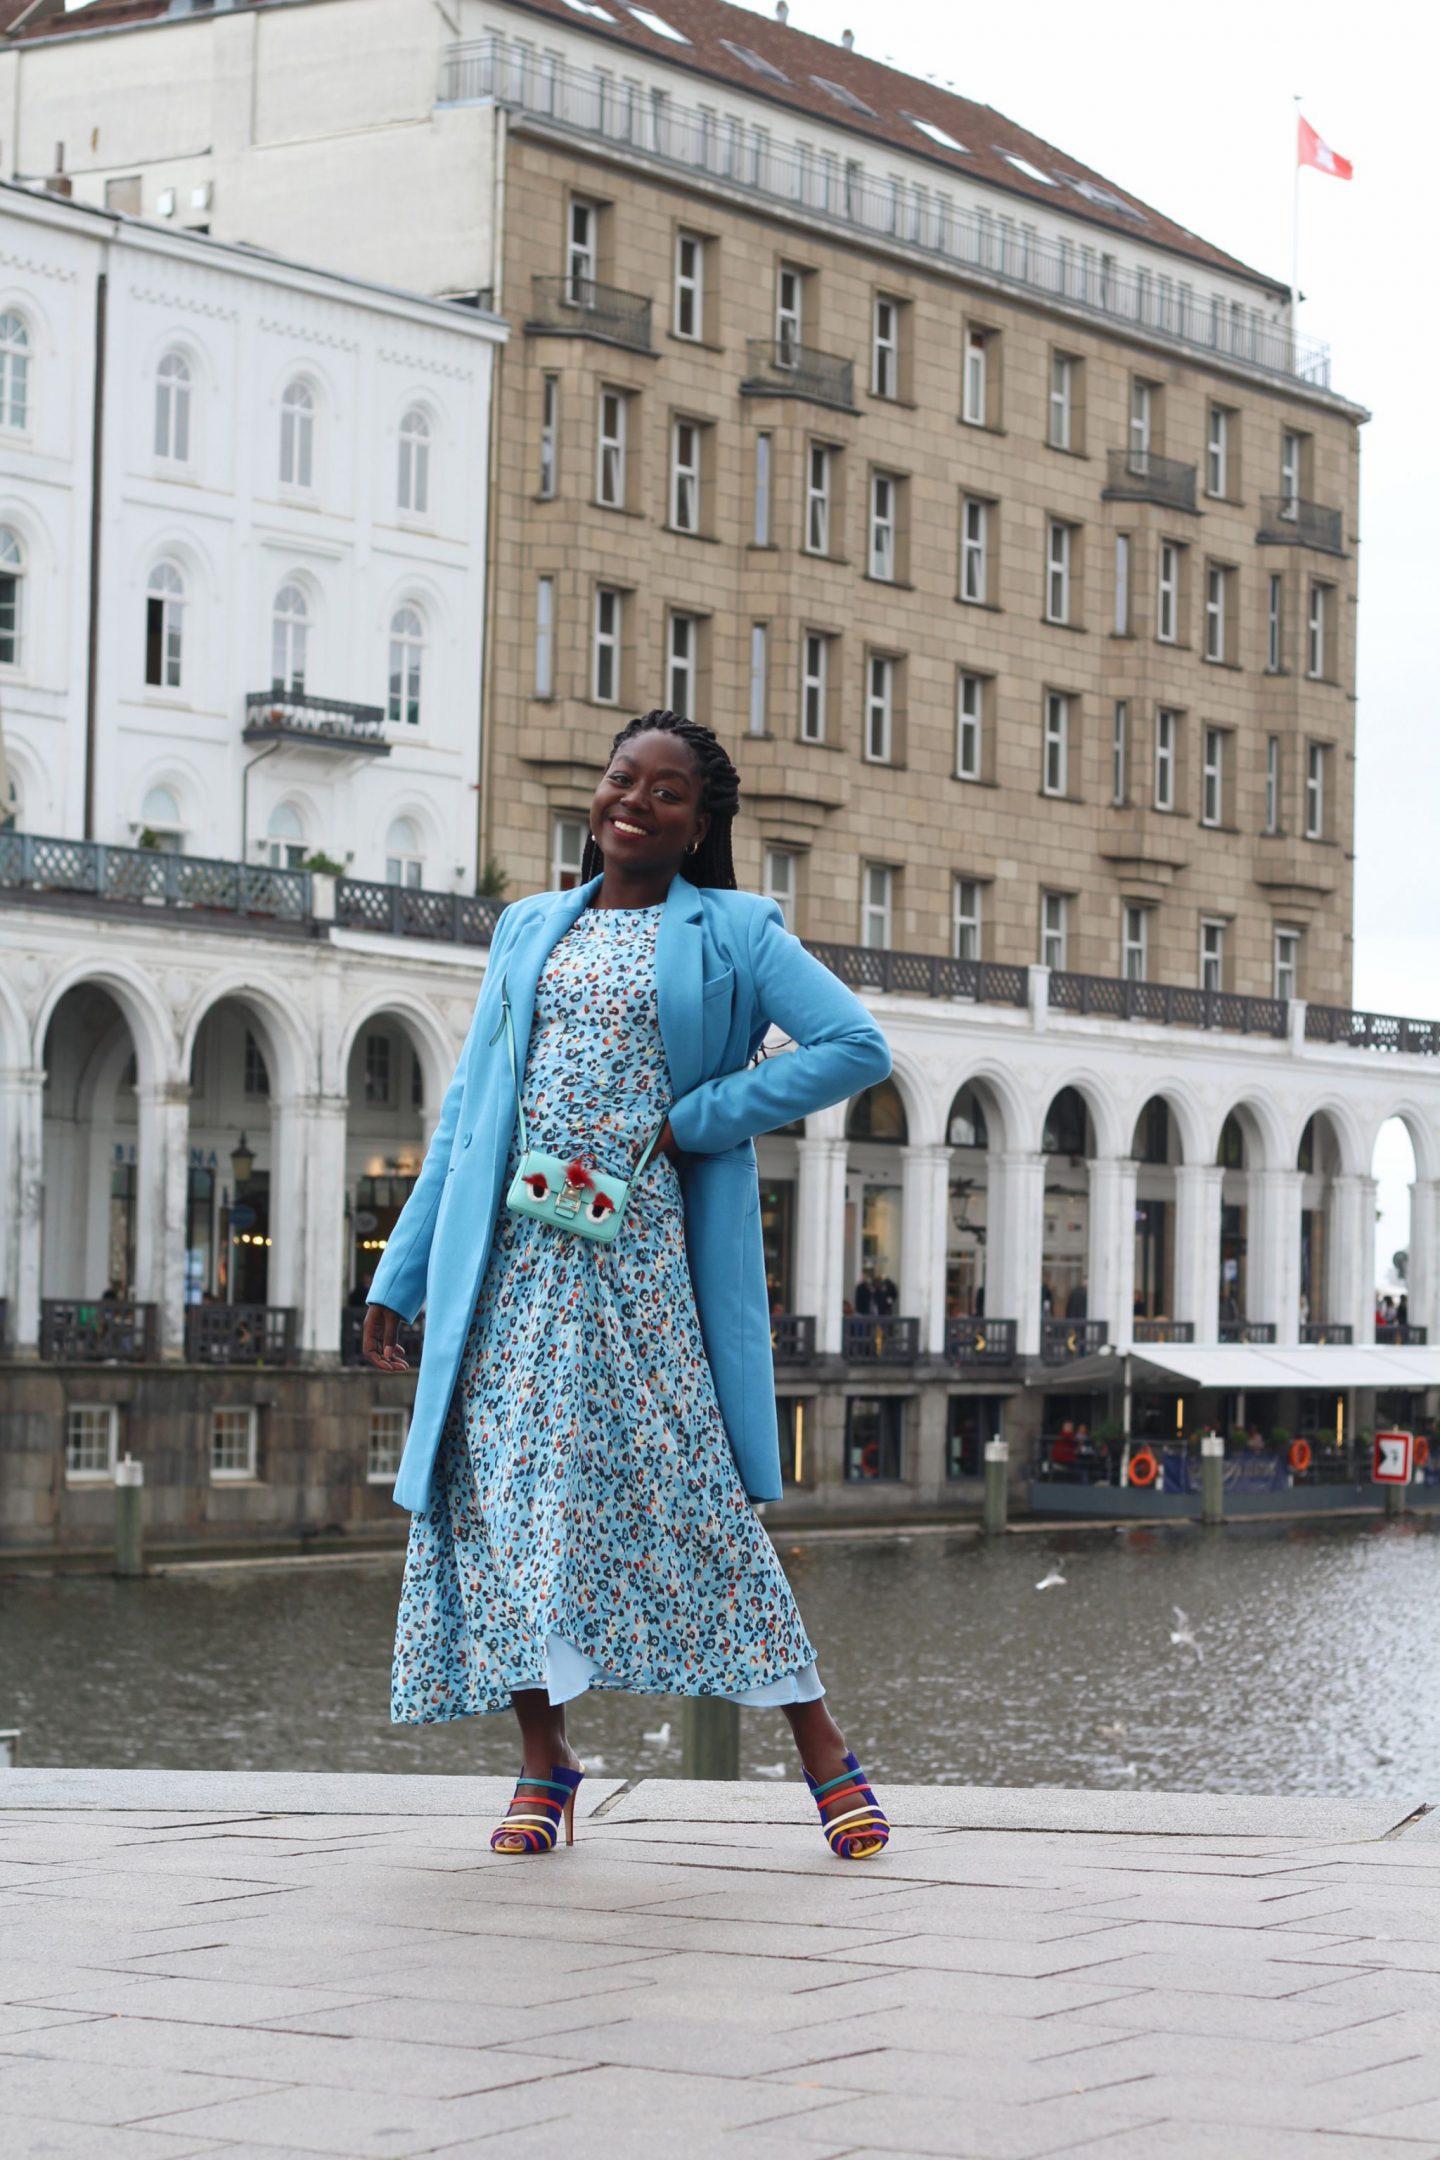 Lala_Berlin_Streetstyle_Lois_Opoku_Fashion_Blogger_Fendi_Monster_